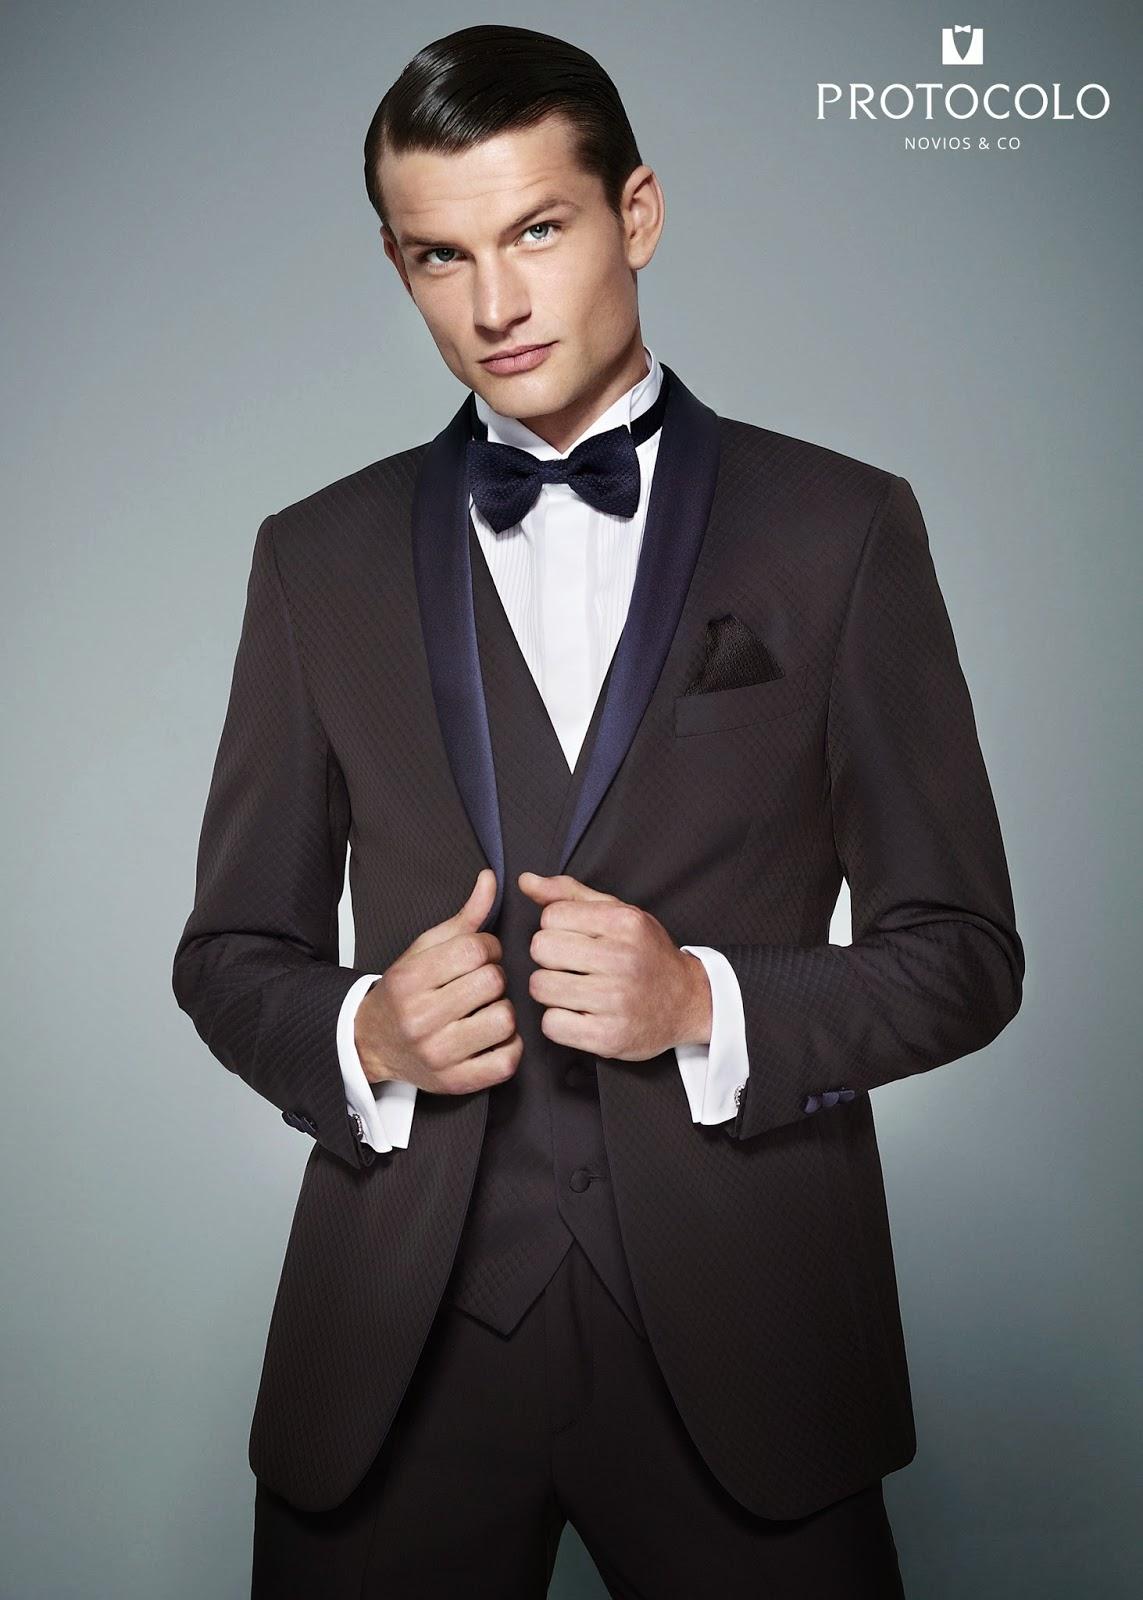 Protocolo novios guia tipos de traje de novio , smoking blog bodas mi boda gratis